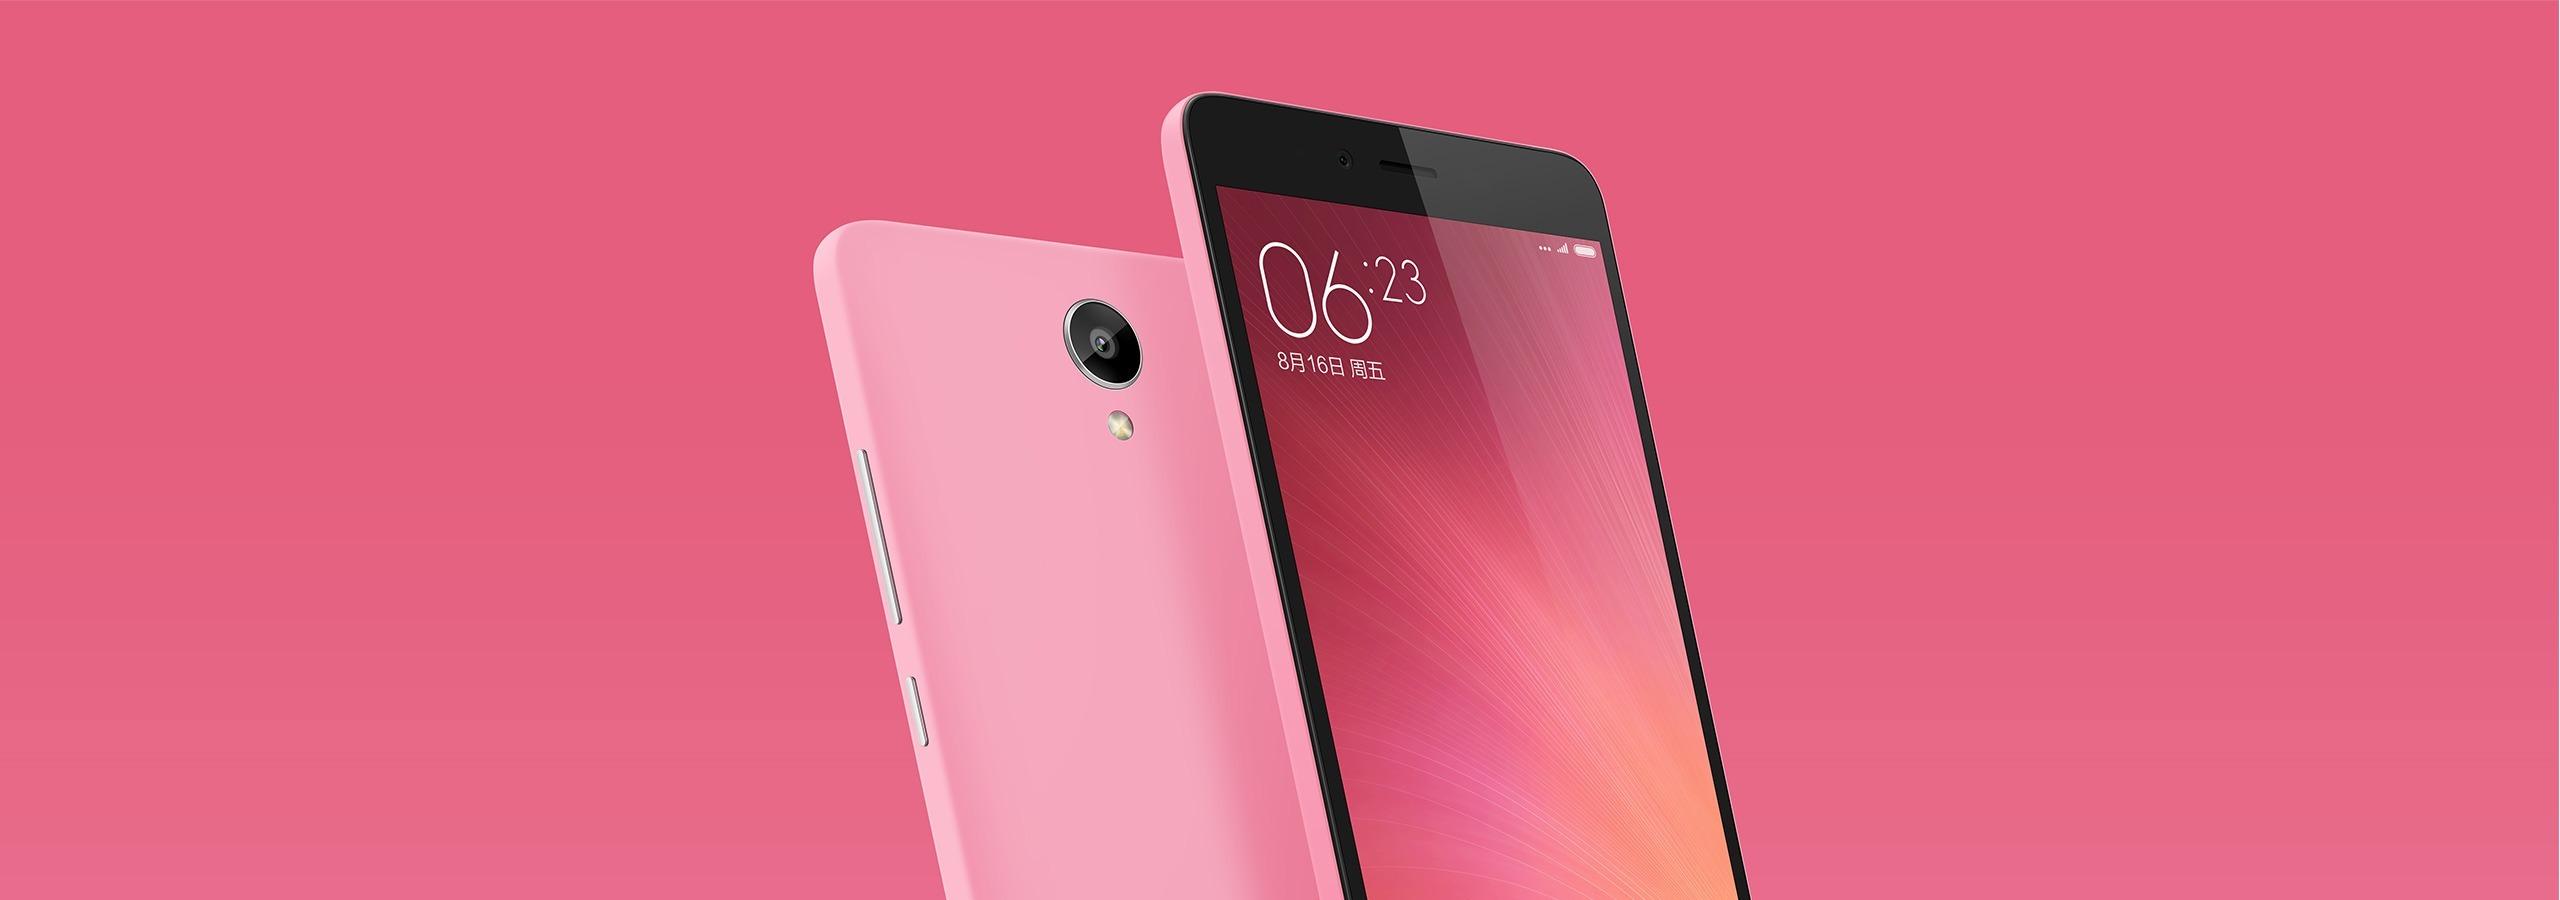 Xiaomi Unveils Faster Redmi Note 2